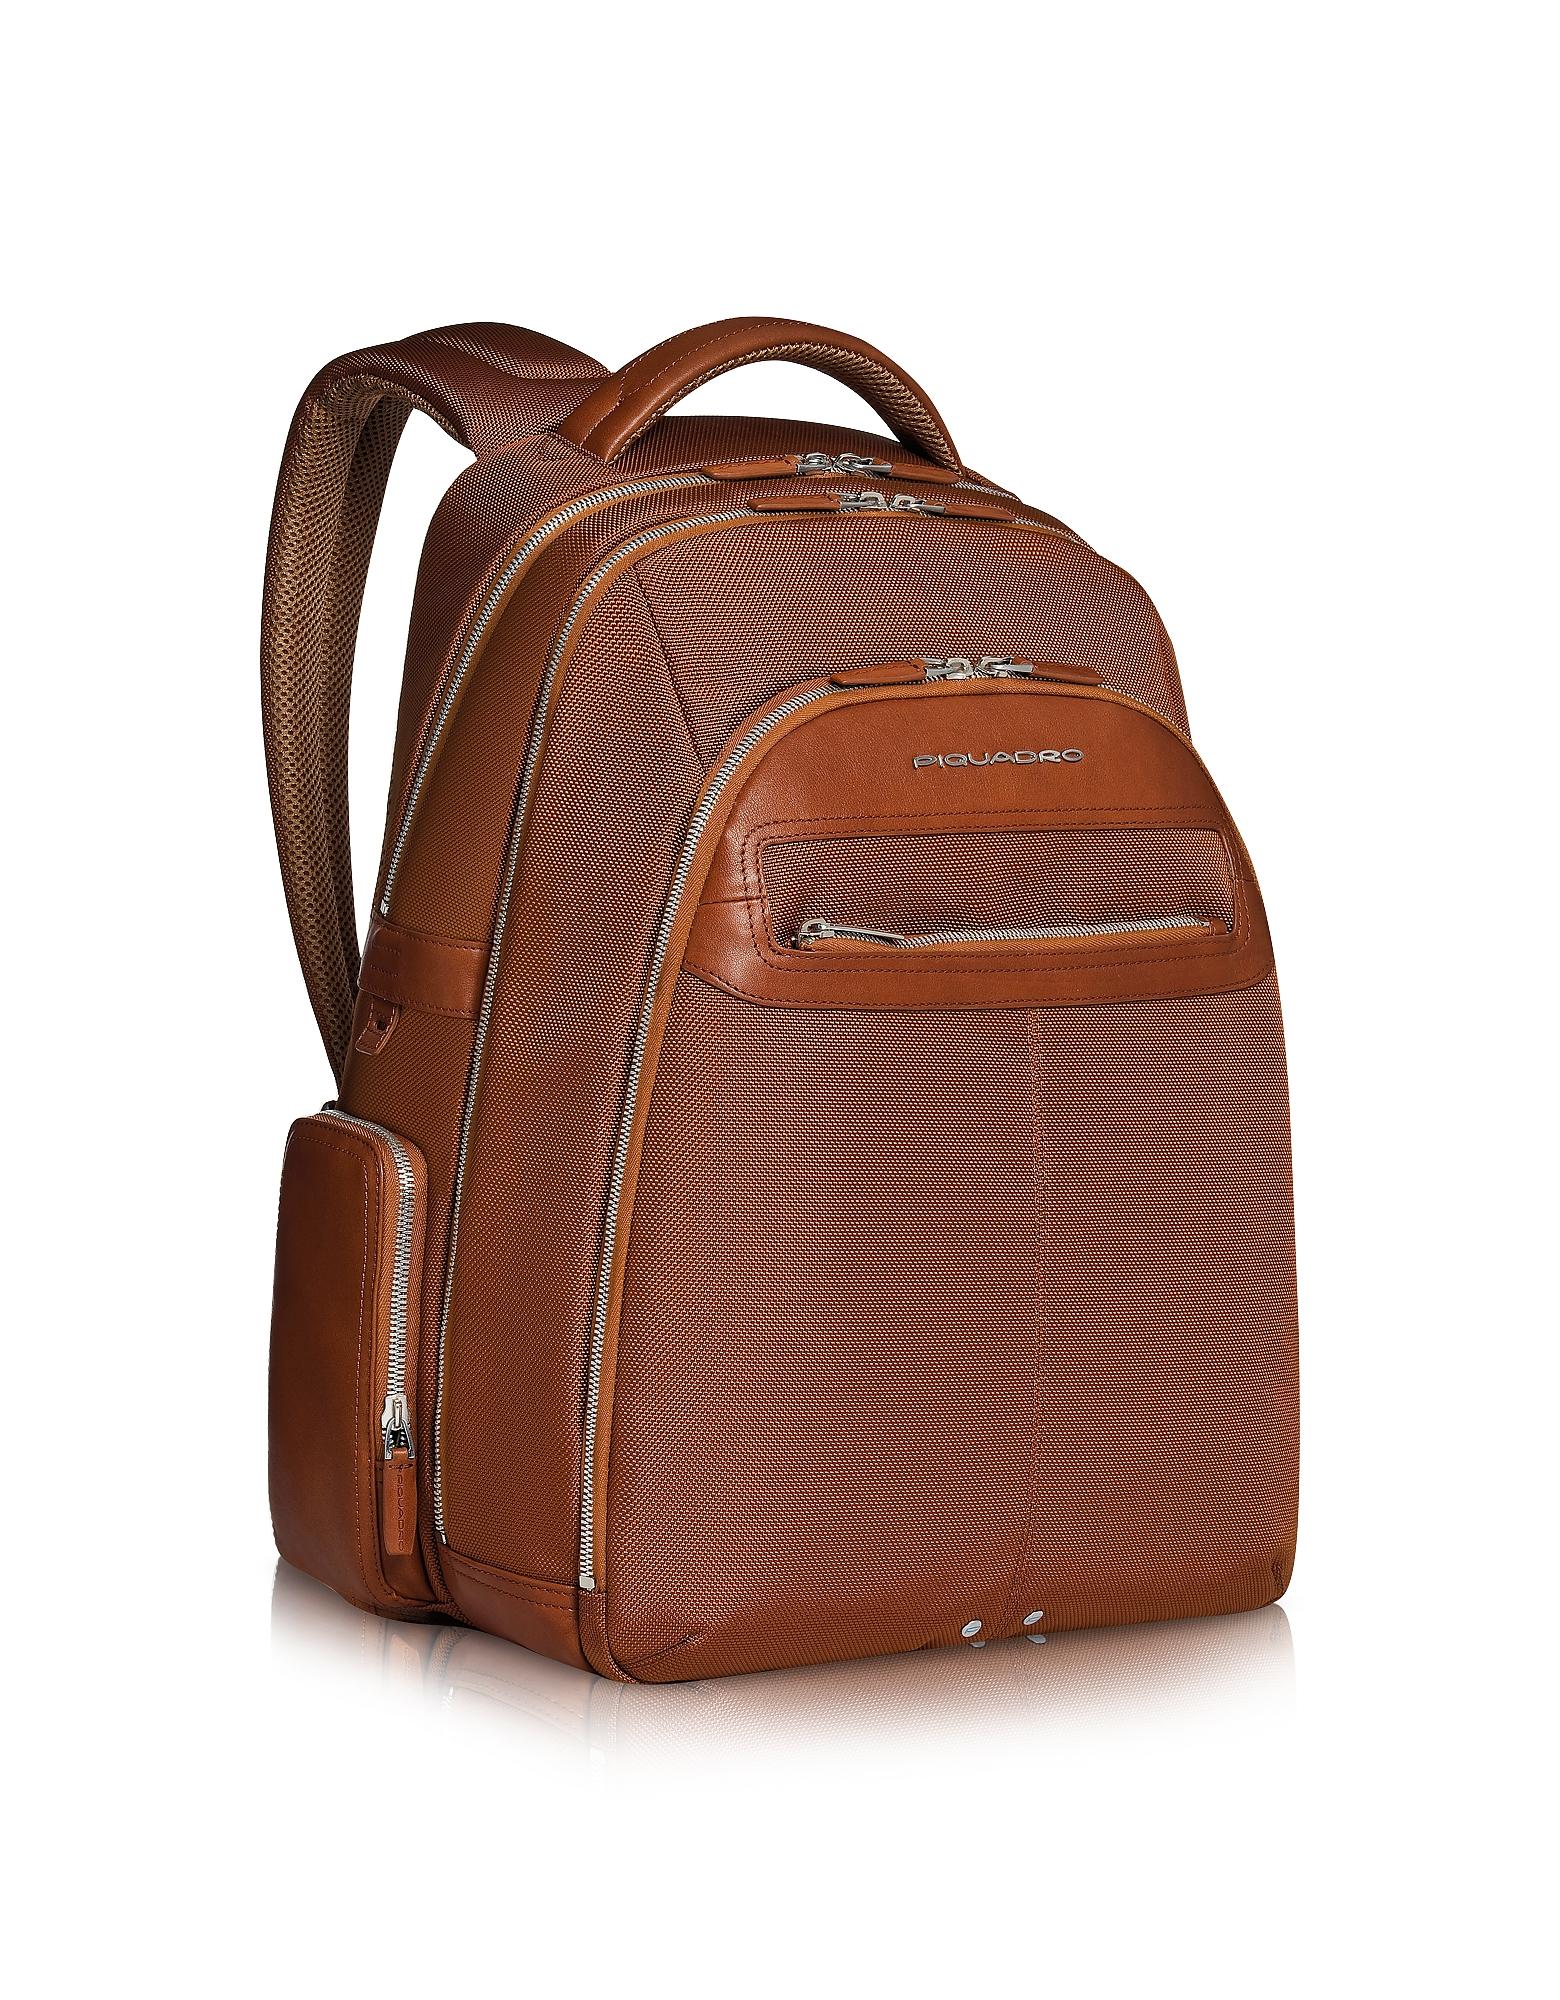 Piquadro Backpacks, Link - Multi-pocket Laptop Backpack